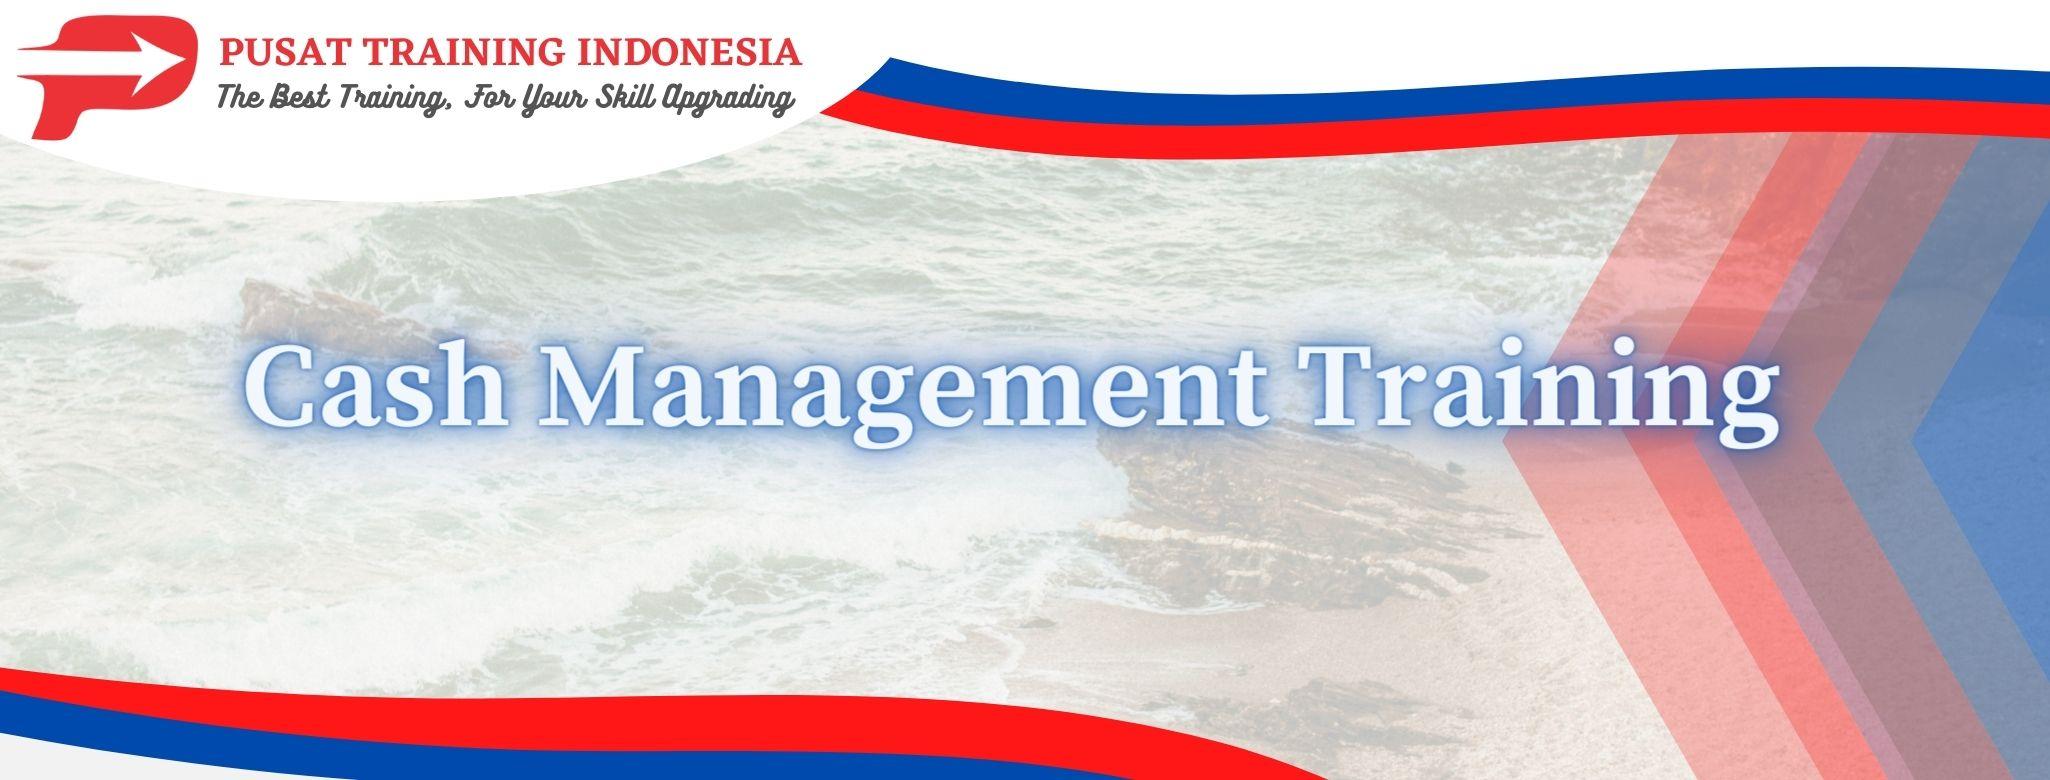 Cash-Management-Training